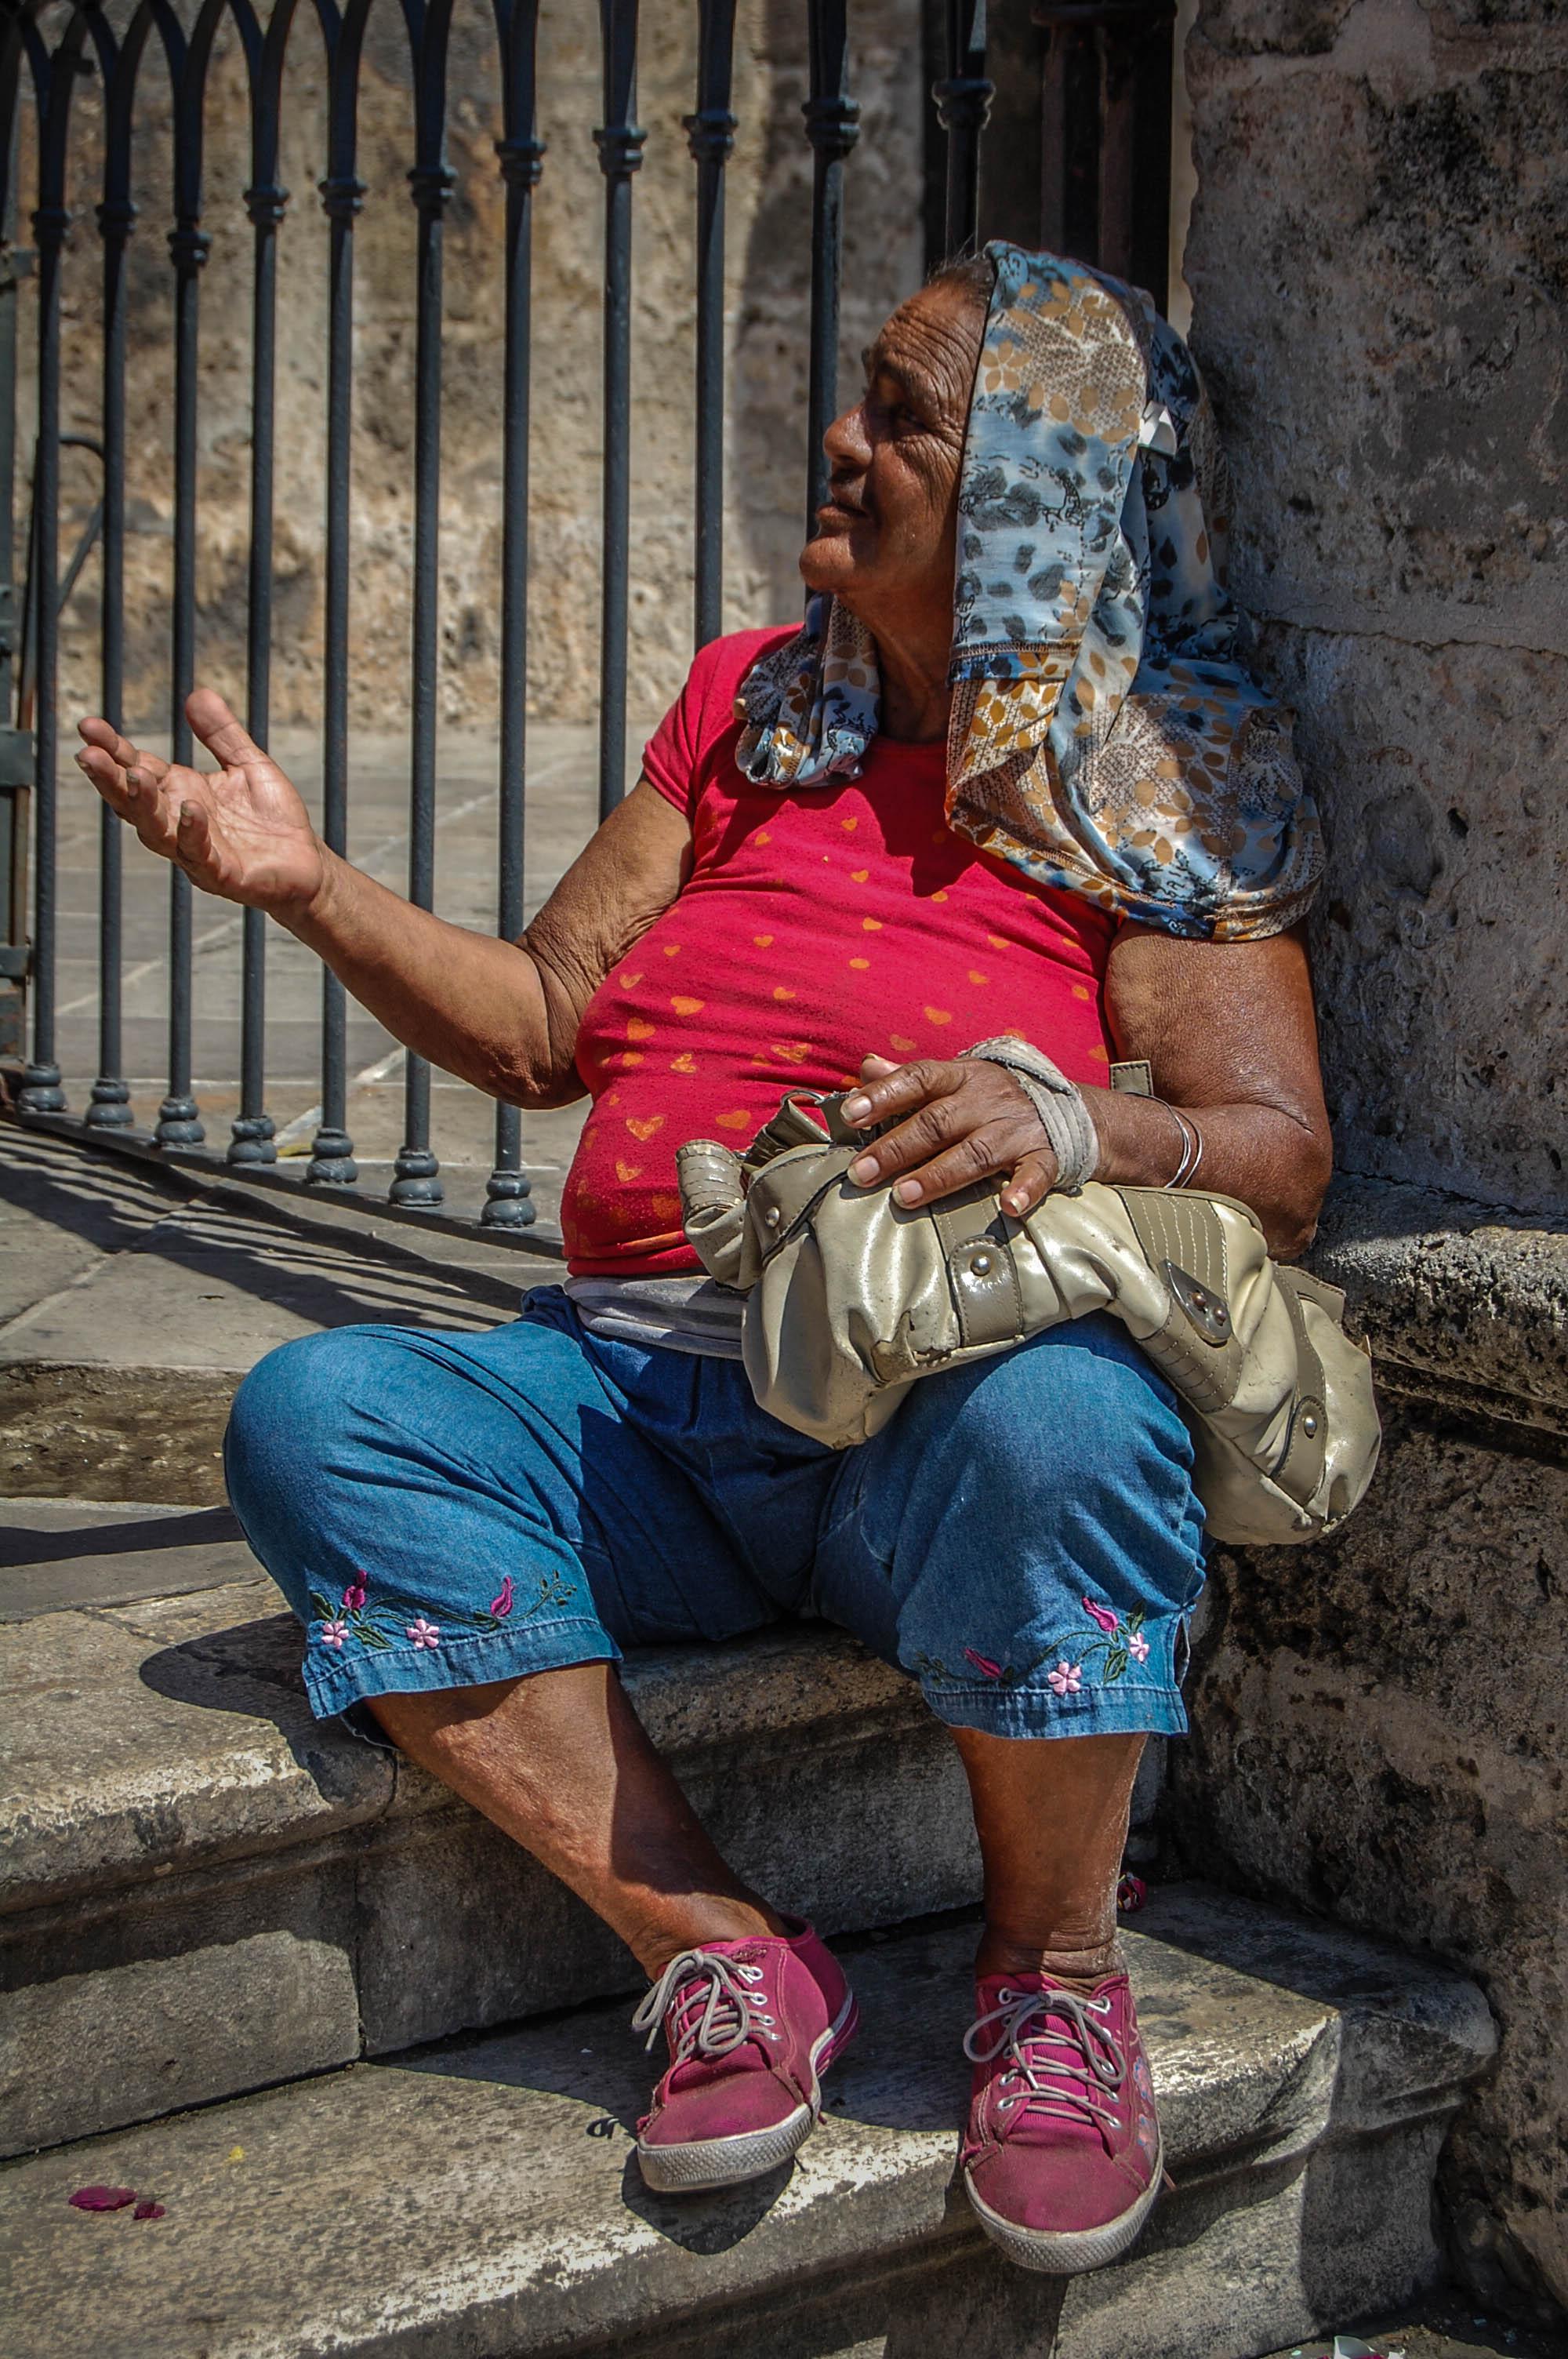 Beggar woman Old Havana, Cuba Nikon D40, 18-55mm F3.5 3.13